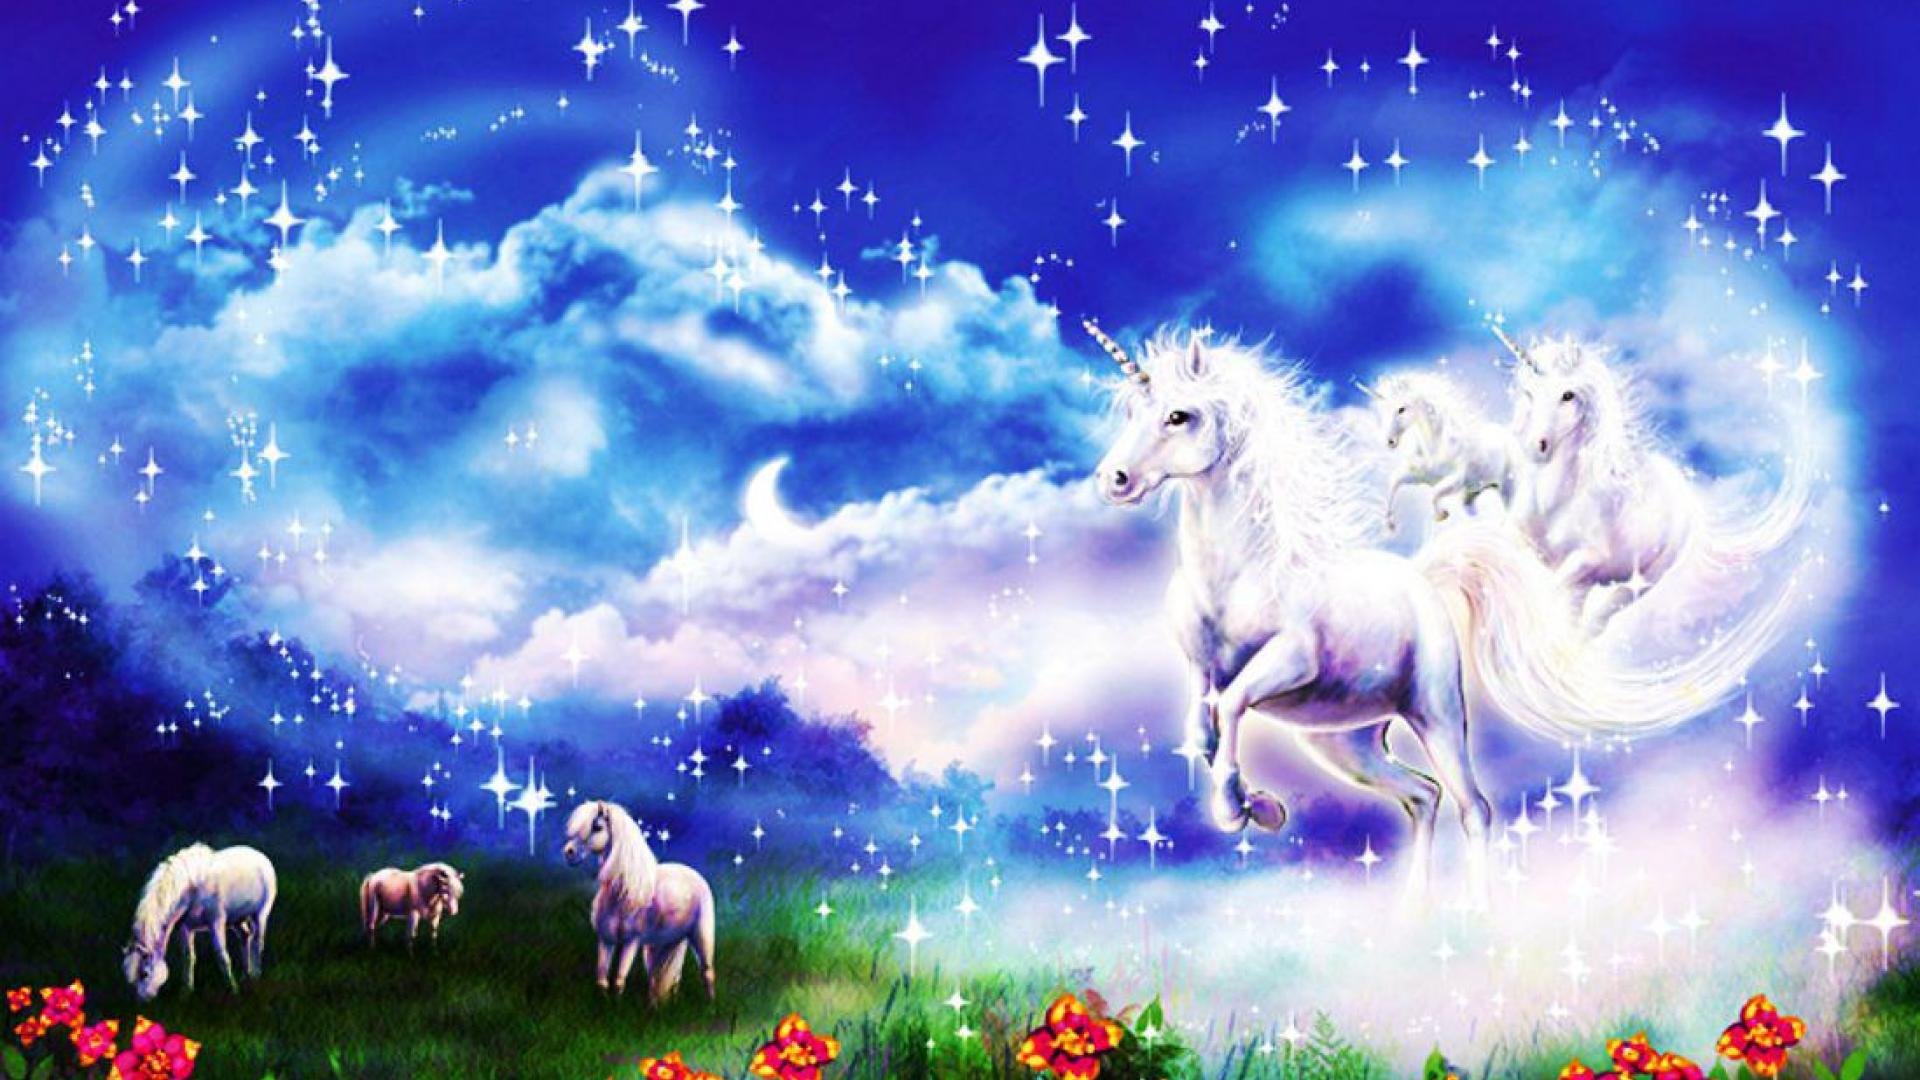 hd unicorn wallpaper - wallpapersafari